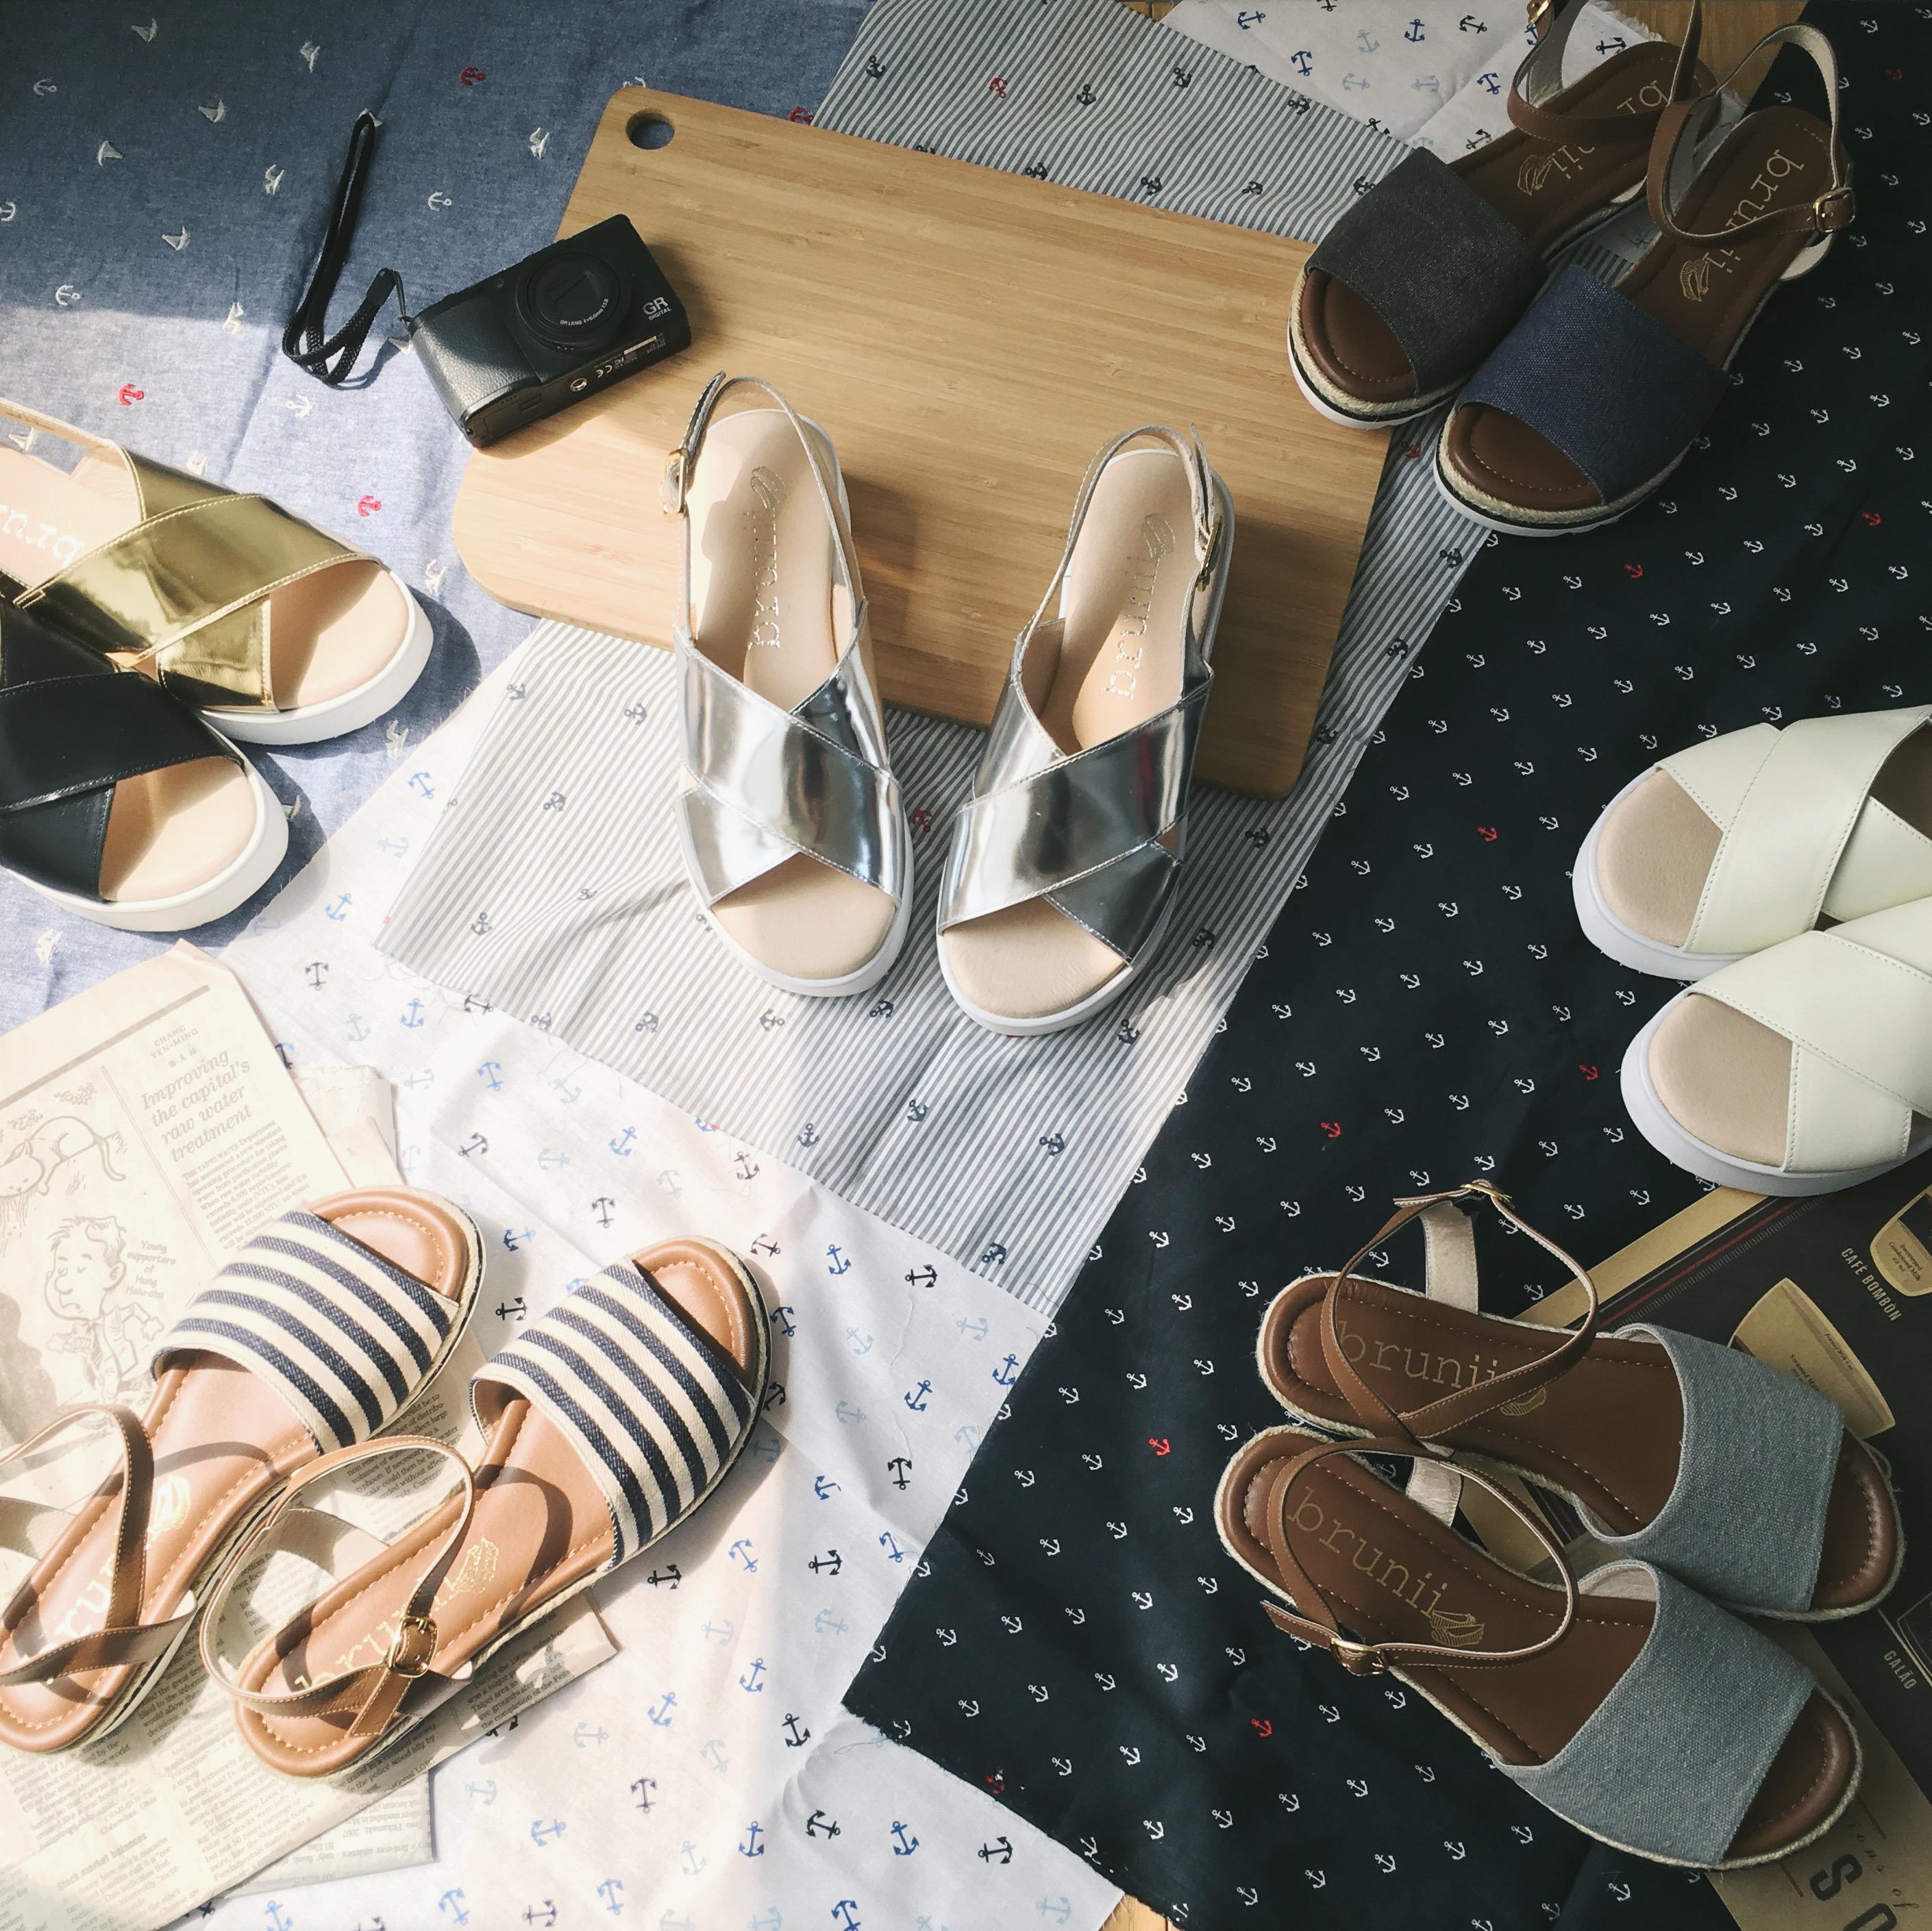 brunii簡單穿好鞋︱the shoes you need everyday. | 臺灣製造MIT真皮手工鞋專賣